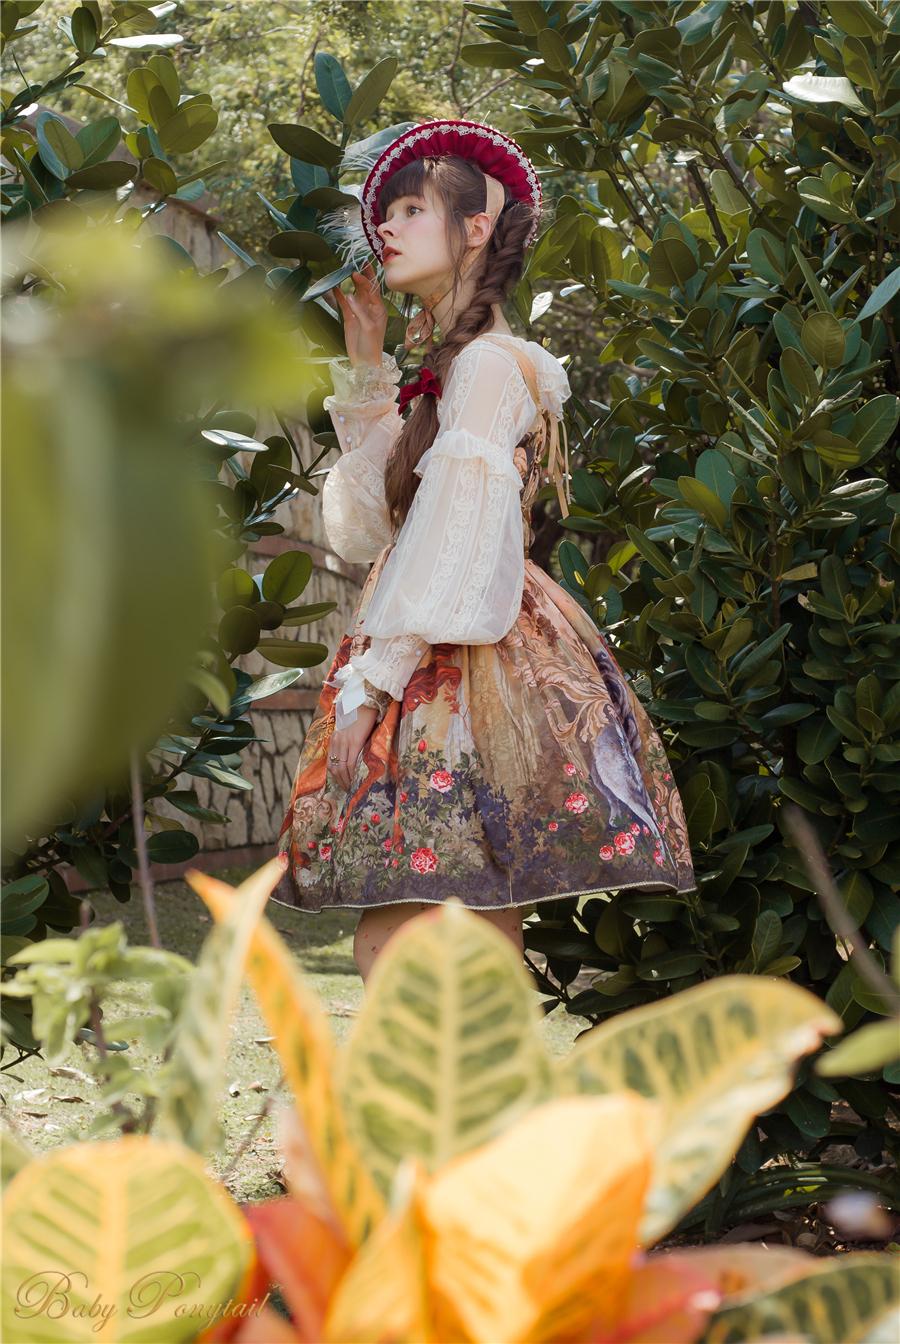 Babyponytail_Rose Battle_Preview_JSK Model Photo_Claudia_1.jpg